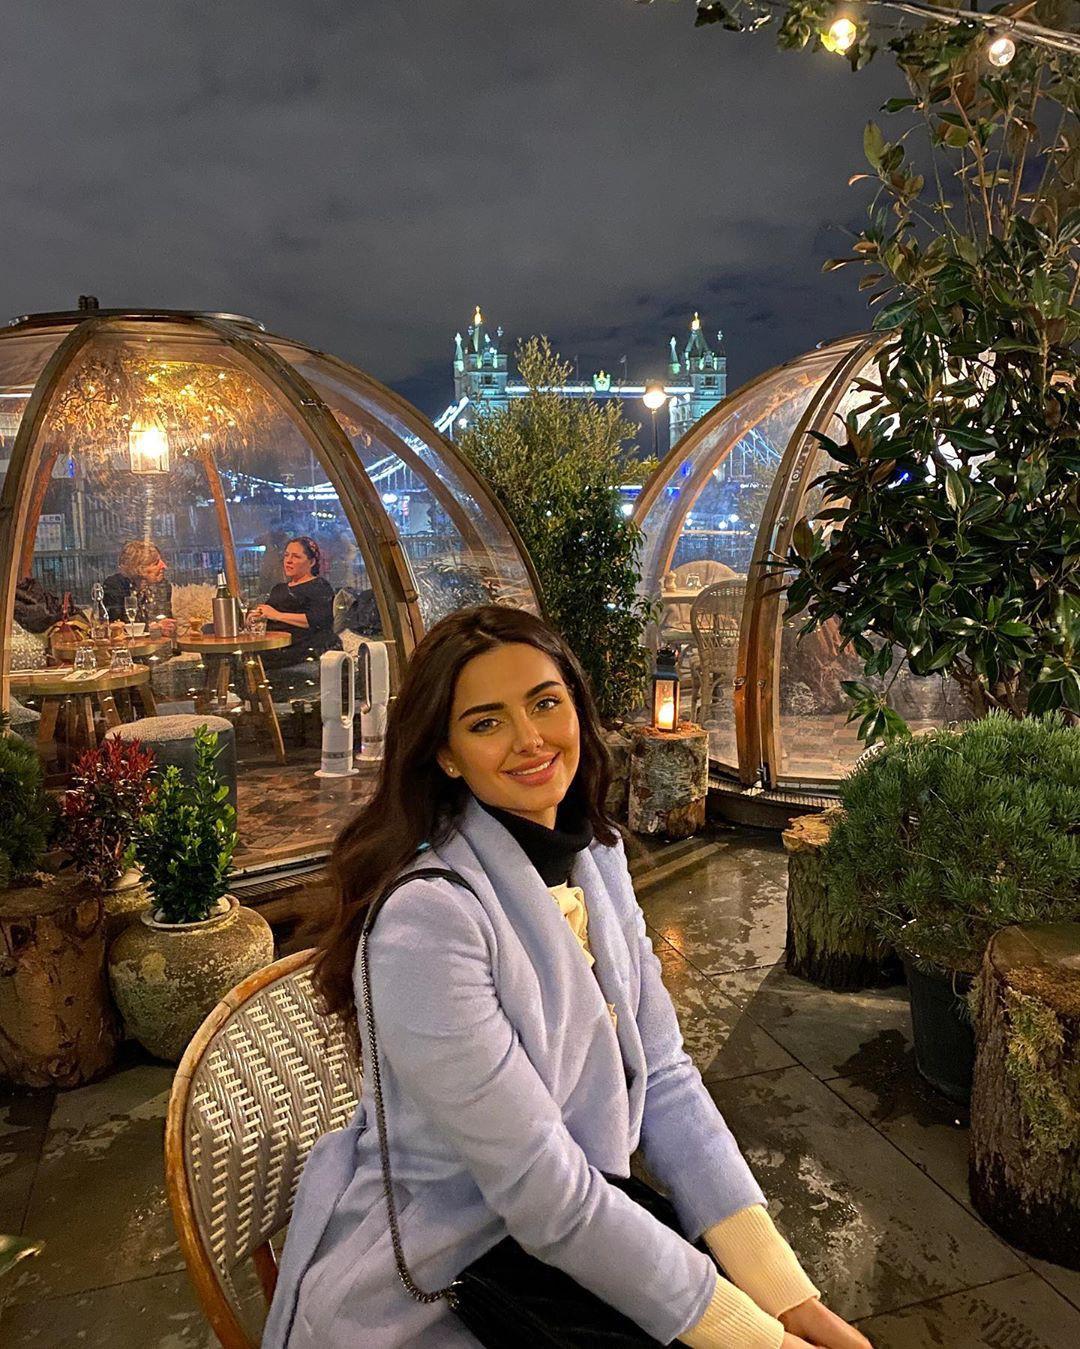 Mahlagha Jaberi cute girls photos, architecture, photography